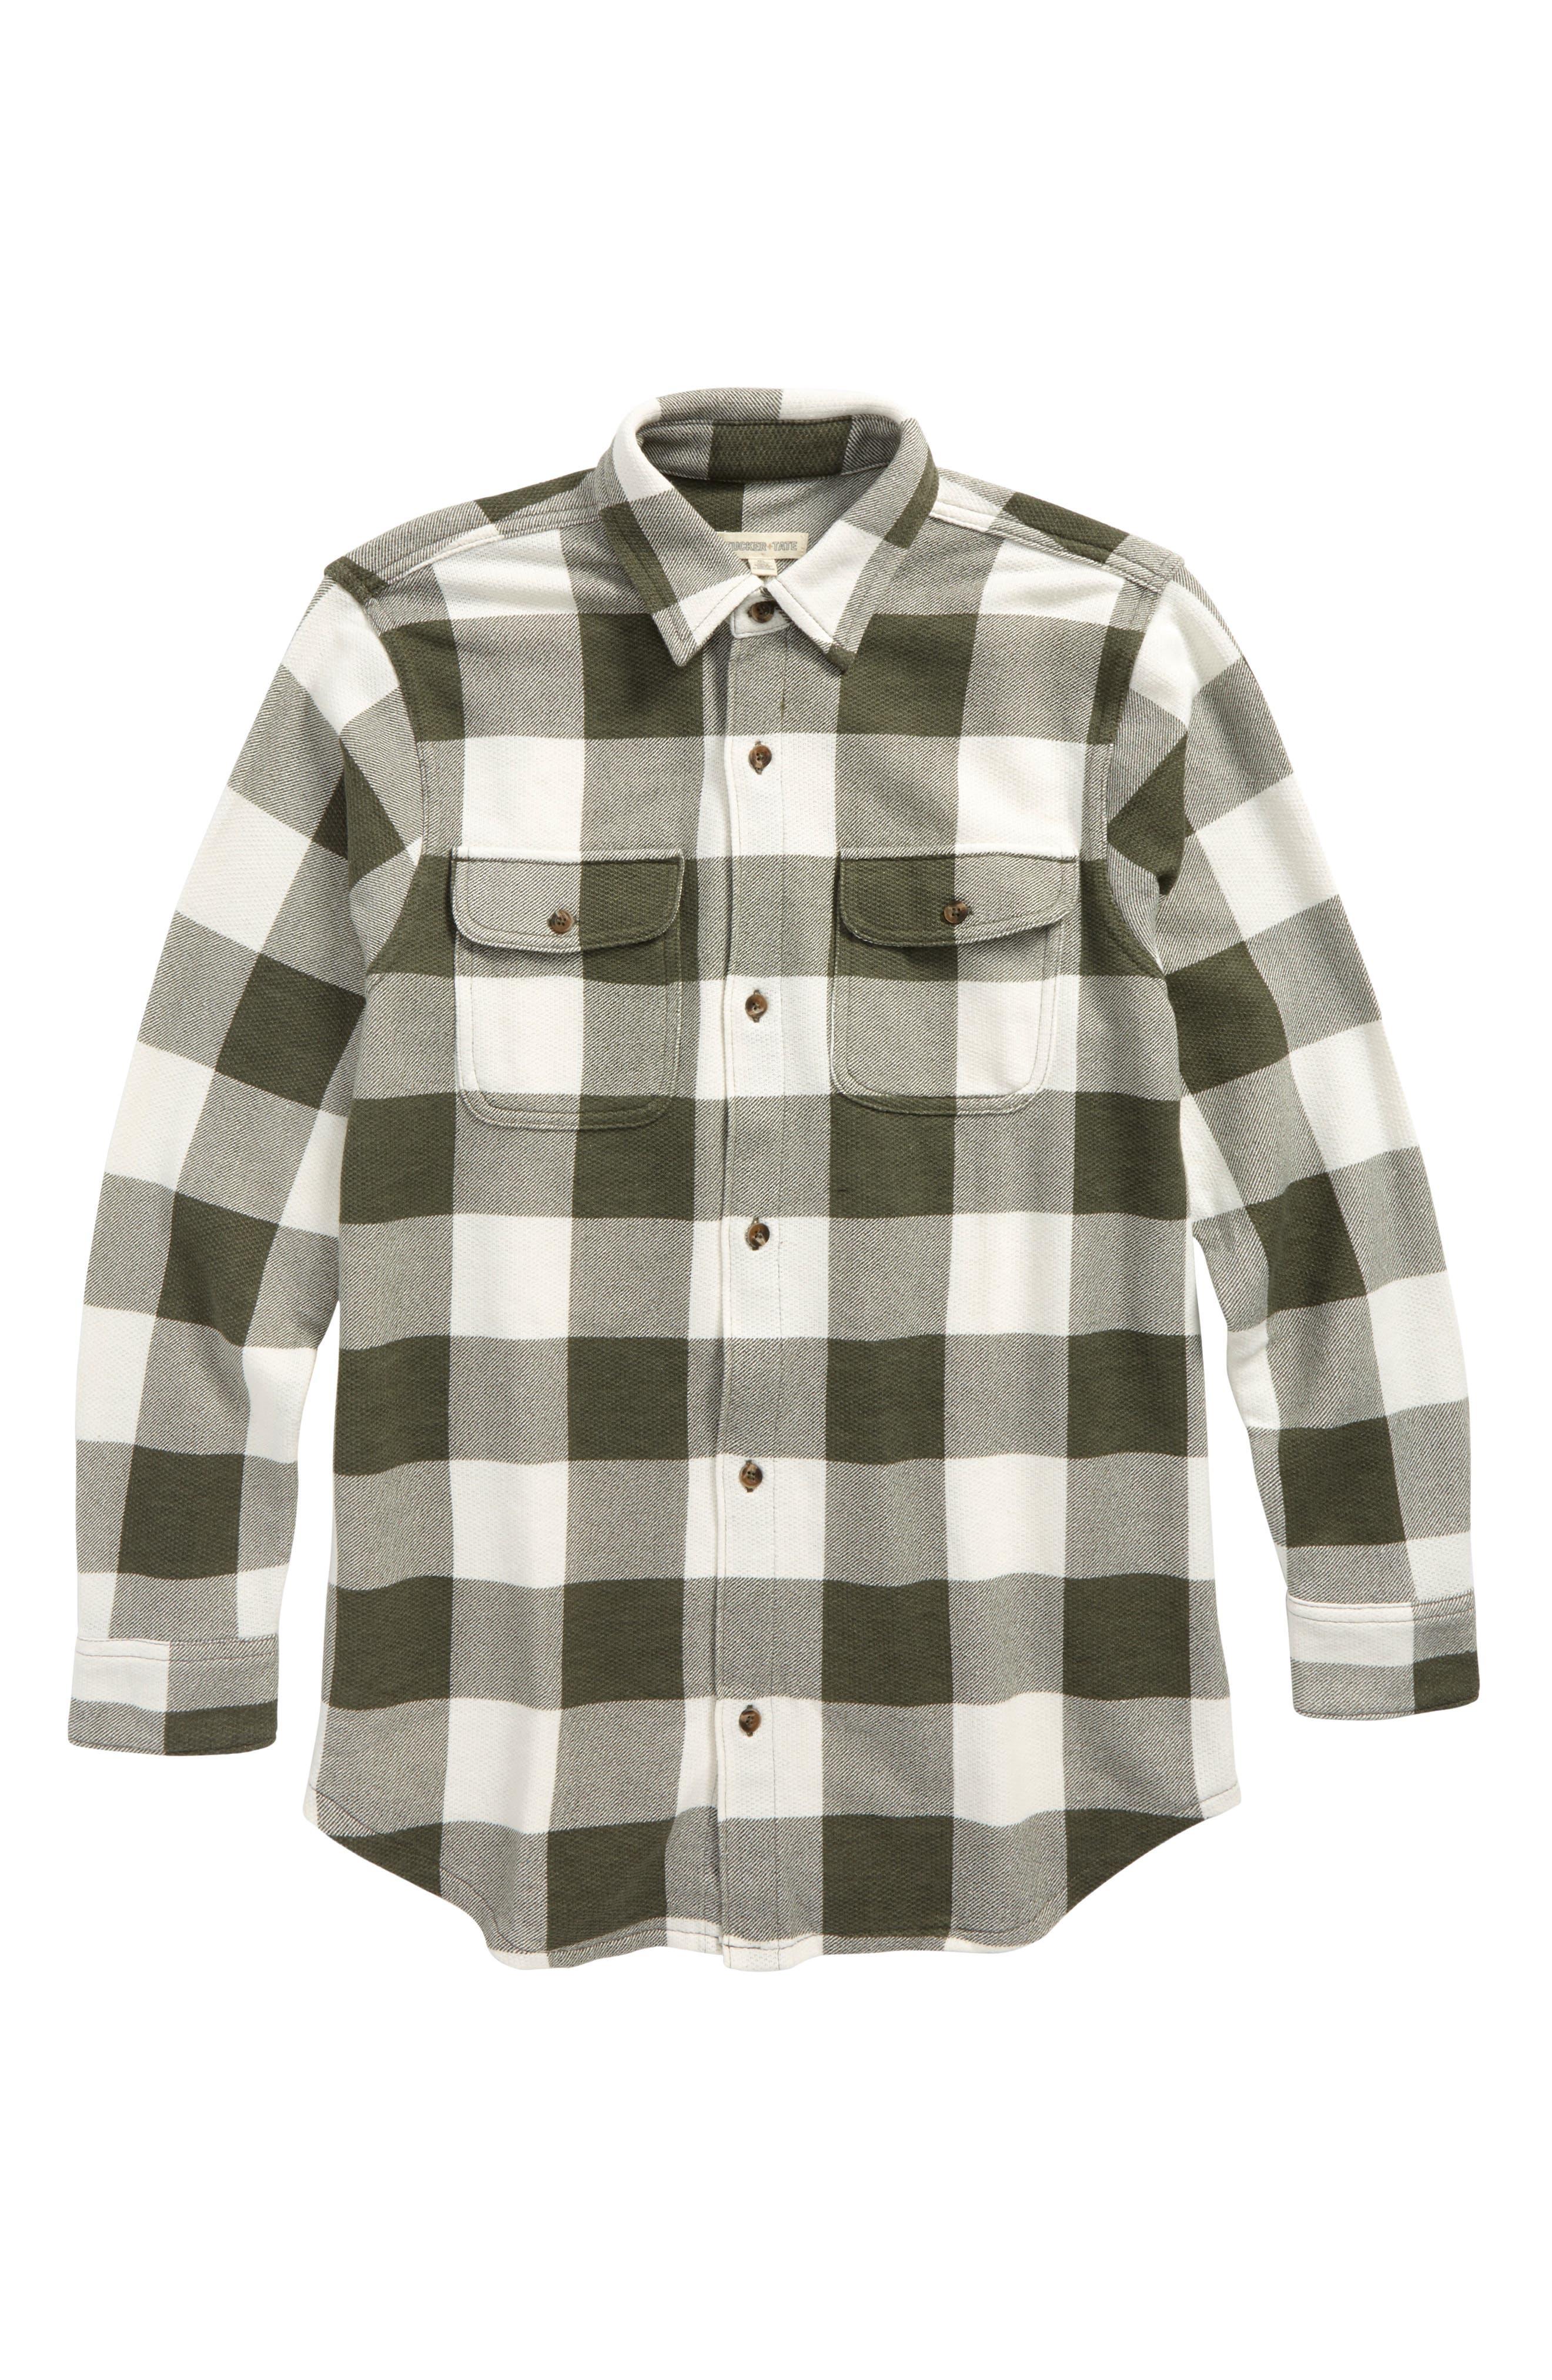 Woven Plaid Shirt,                         Main,                         color, Olive Sarma- Ivory Check